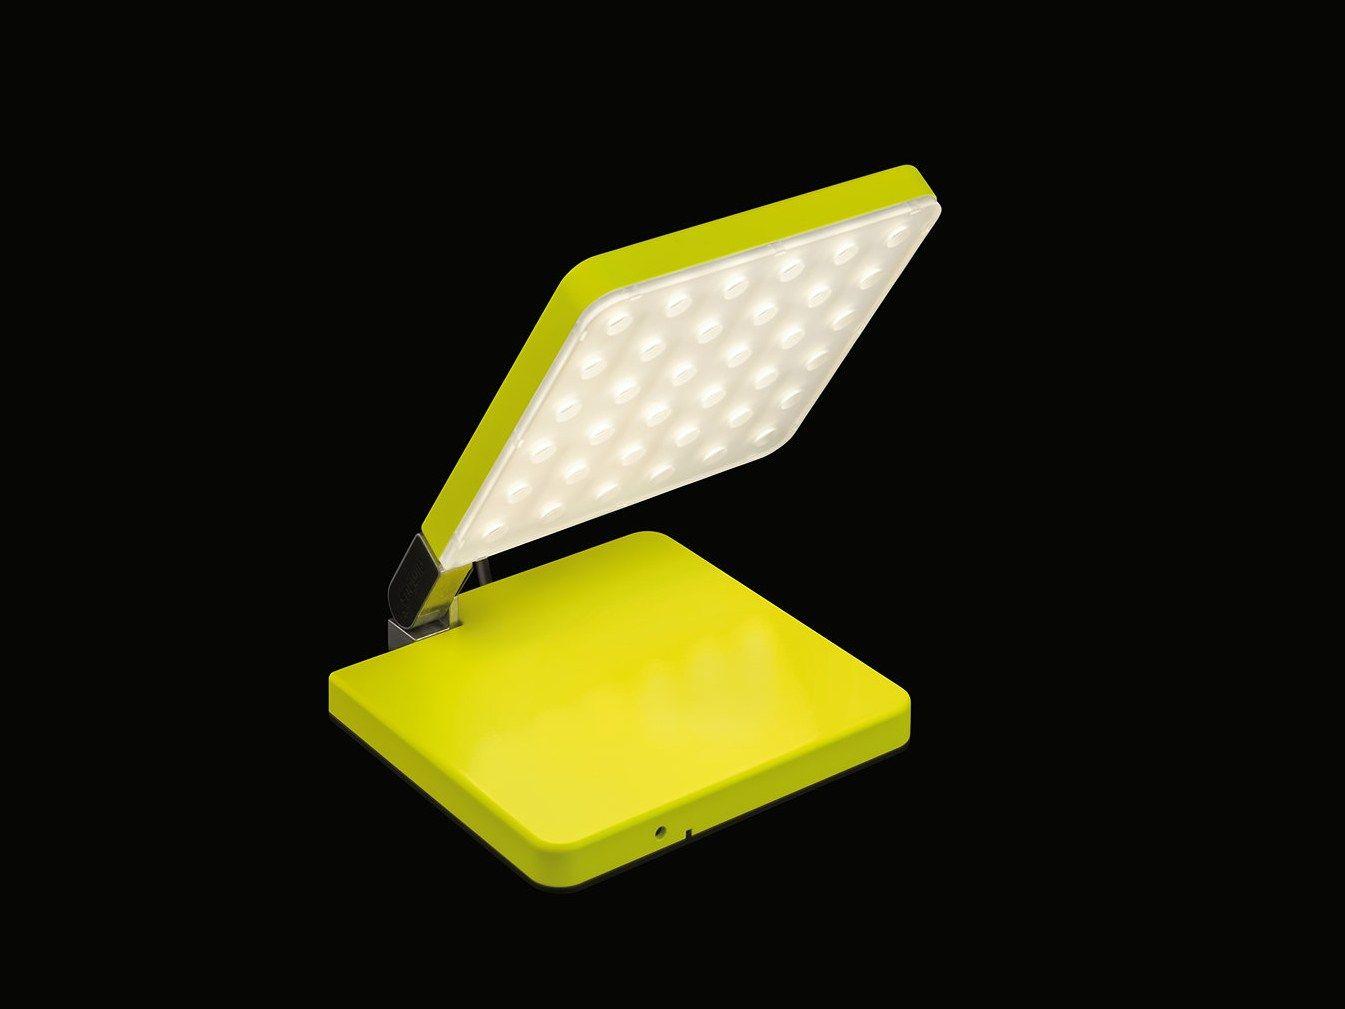 lampada portabile a led orientabile con dimmer roxxane fly. Black Bedroom Furniture Sets. Home Design Ideas